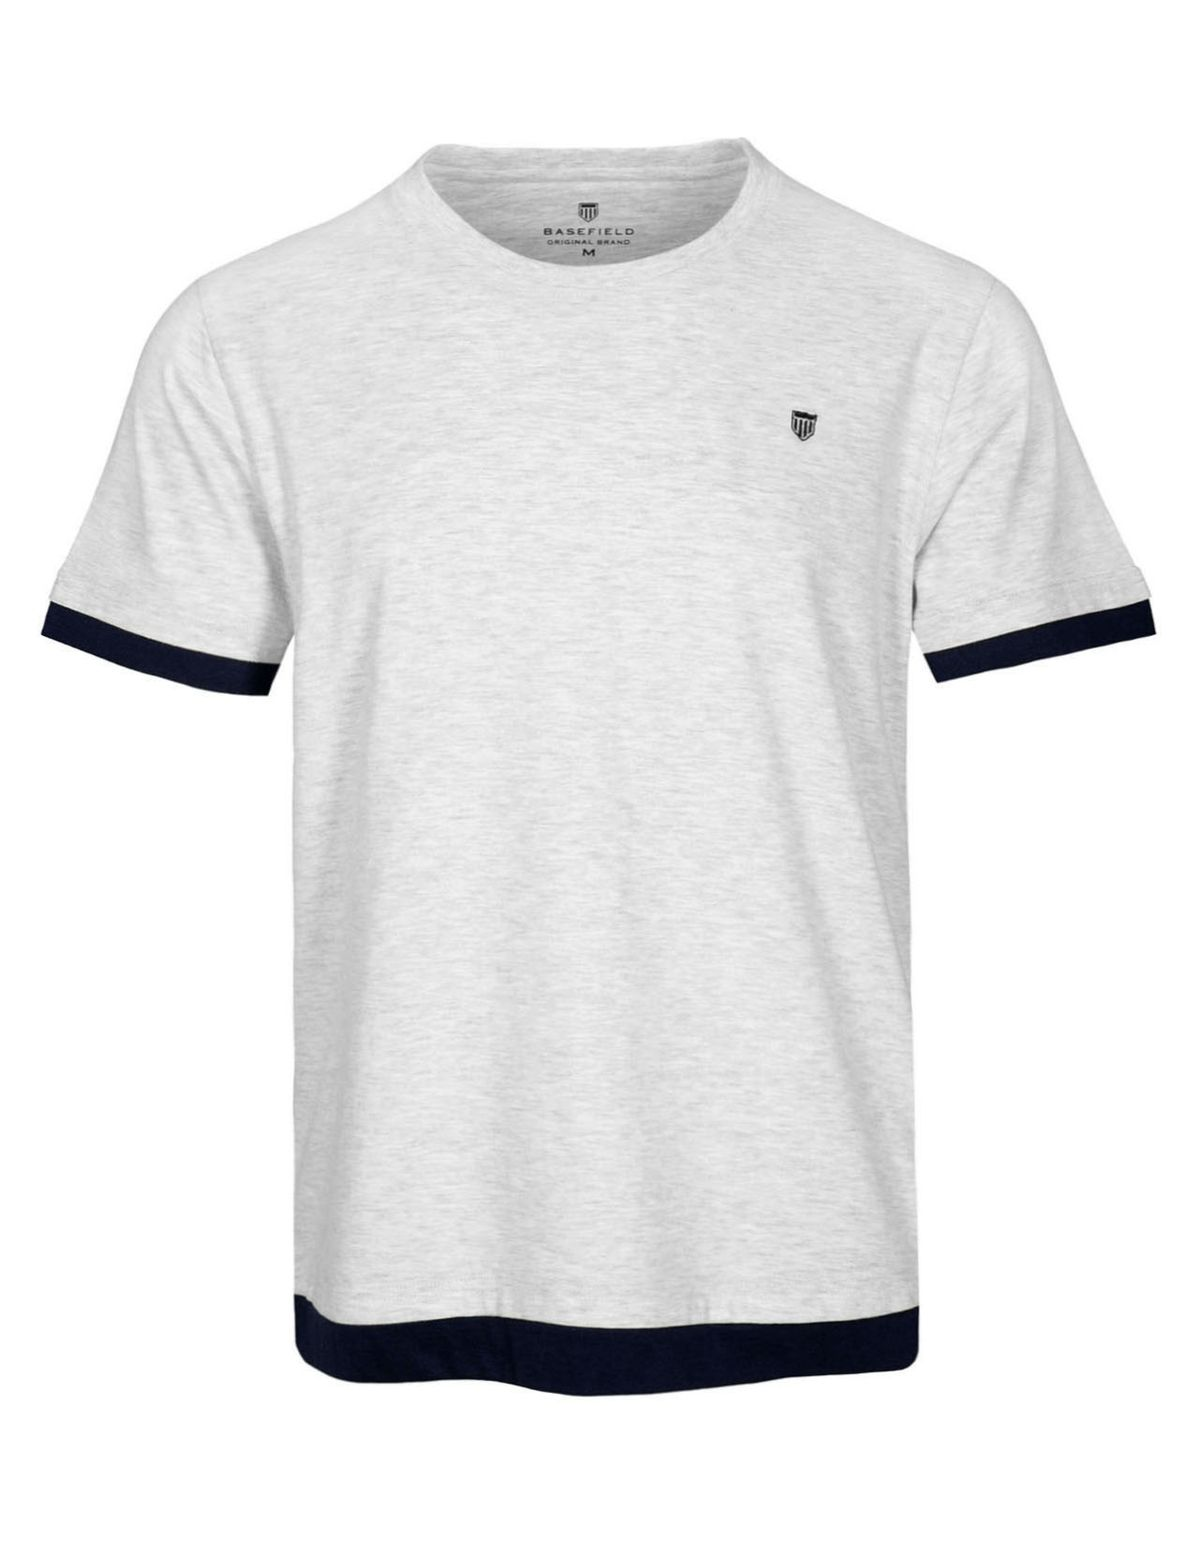 HOMEWEAR Pyjama Shirt in Layer-Optik - Grey Melange